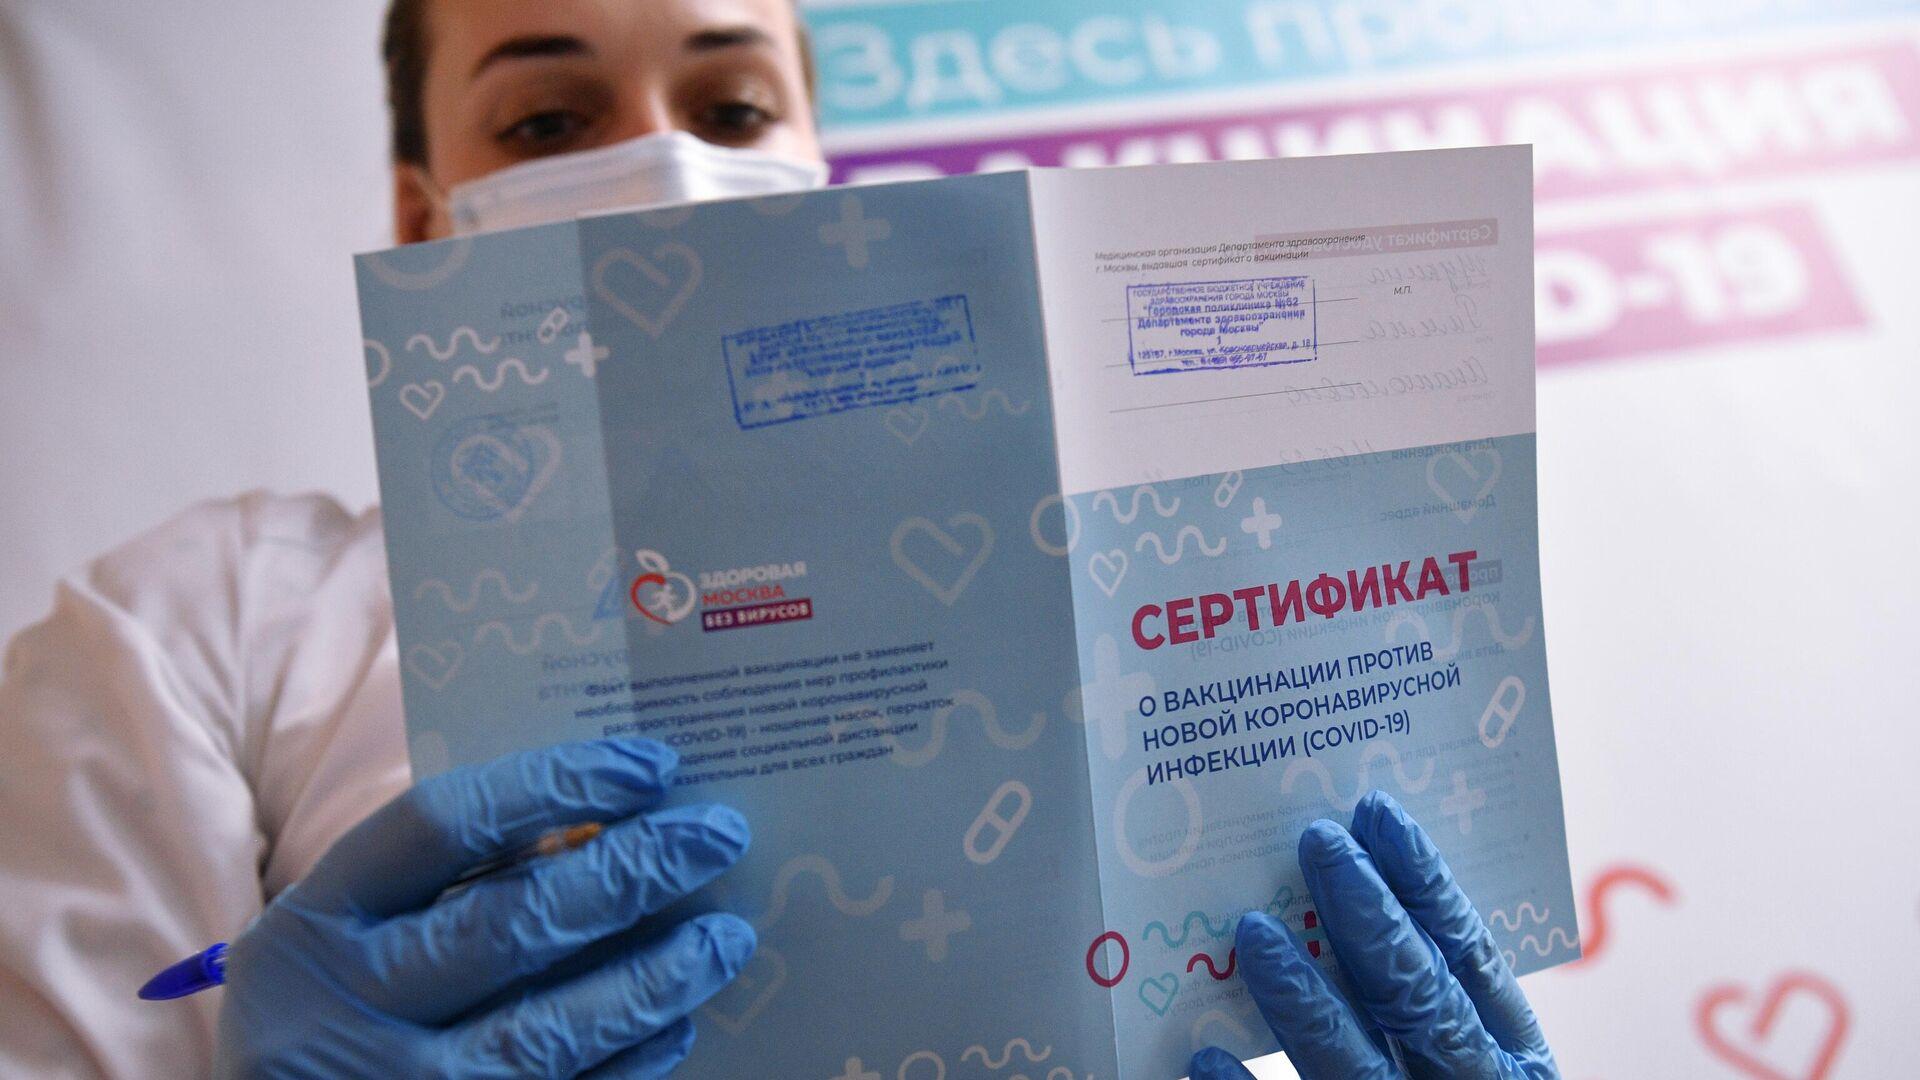 Сертификат о вакцинации против коронавирусной инфекции (COVID-19) - РИА Новости, 1920, 19.07.2021